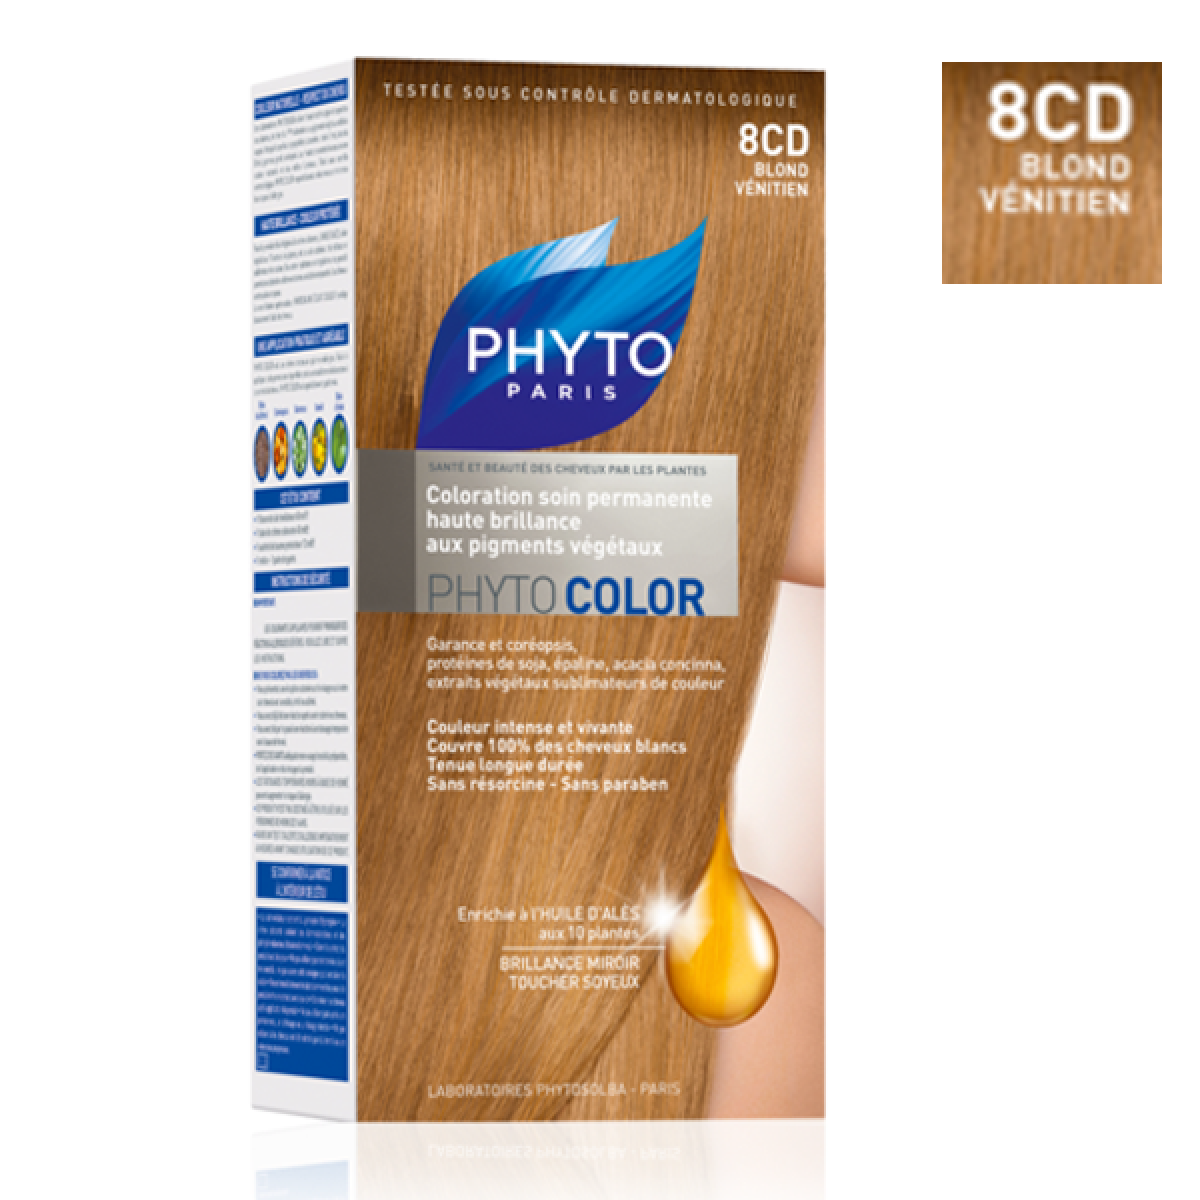 phyto phytocolor coloration permanente 8cd blond v nitien 1 kit parapharmacie pharmarket. Black Bedroom Furniture Sets. Home Design Ideas